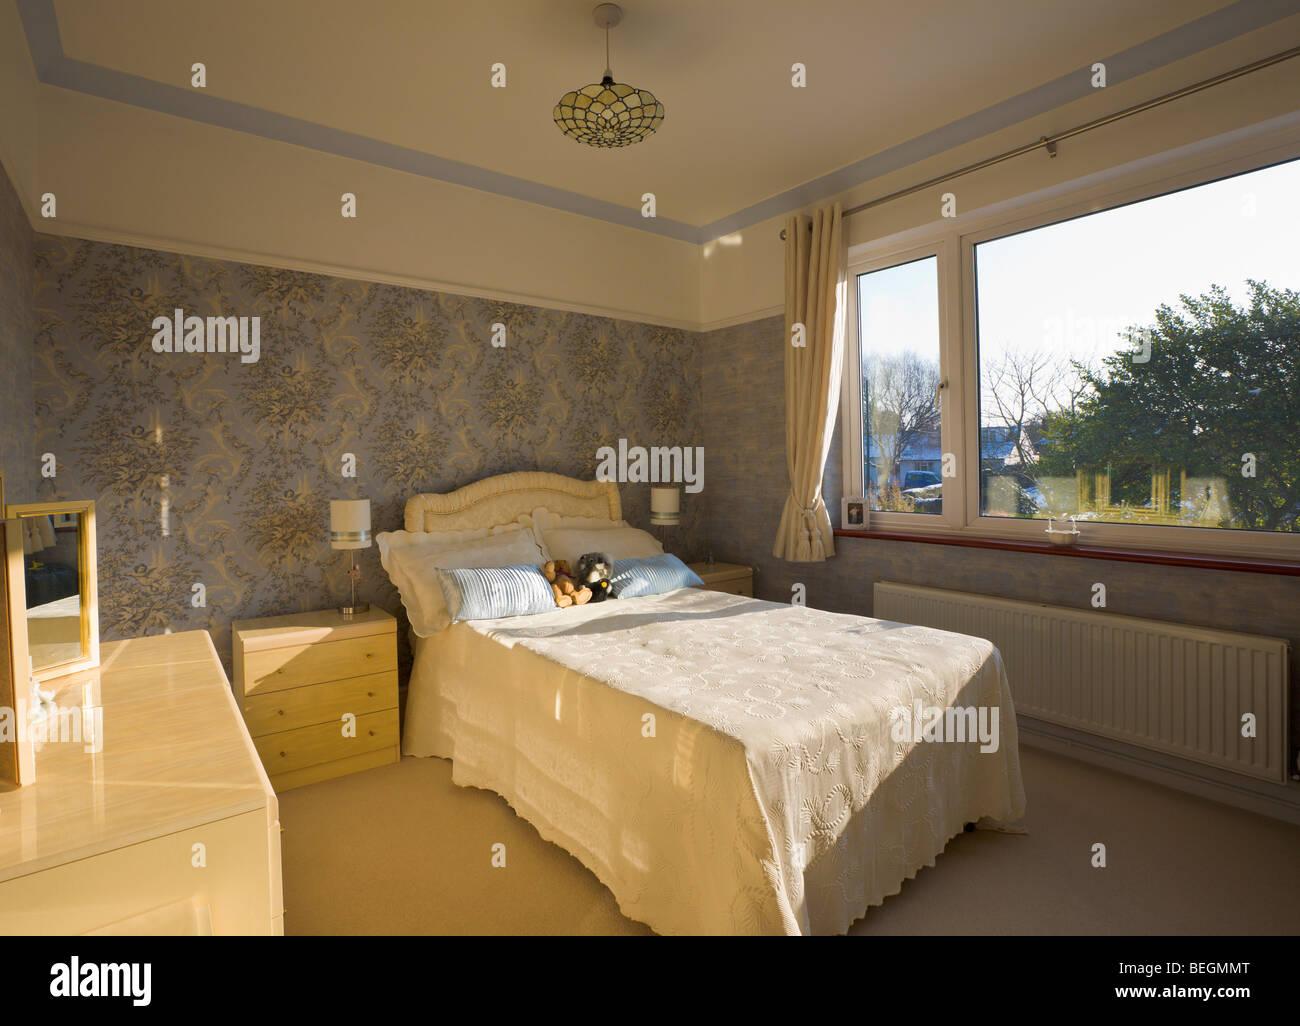 Double bedroom - Stock Image